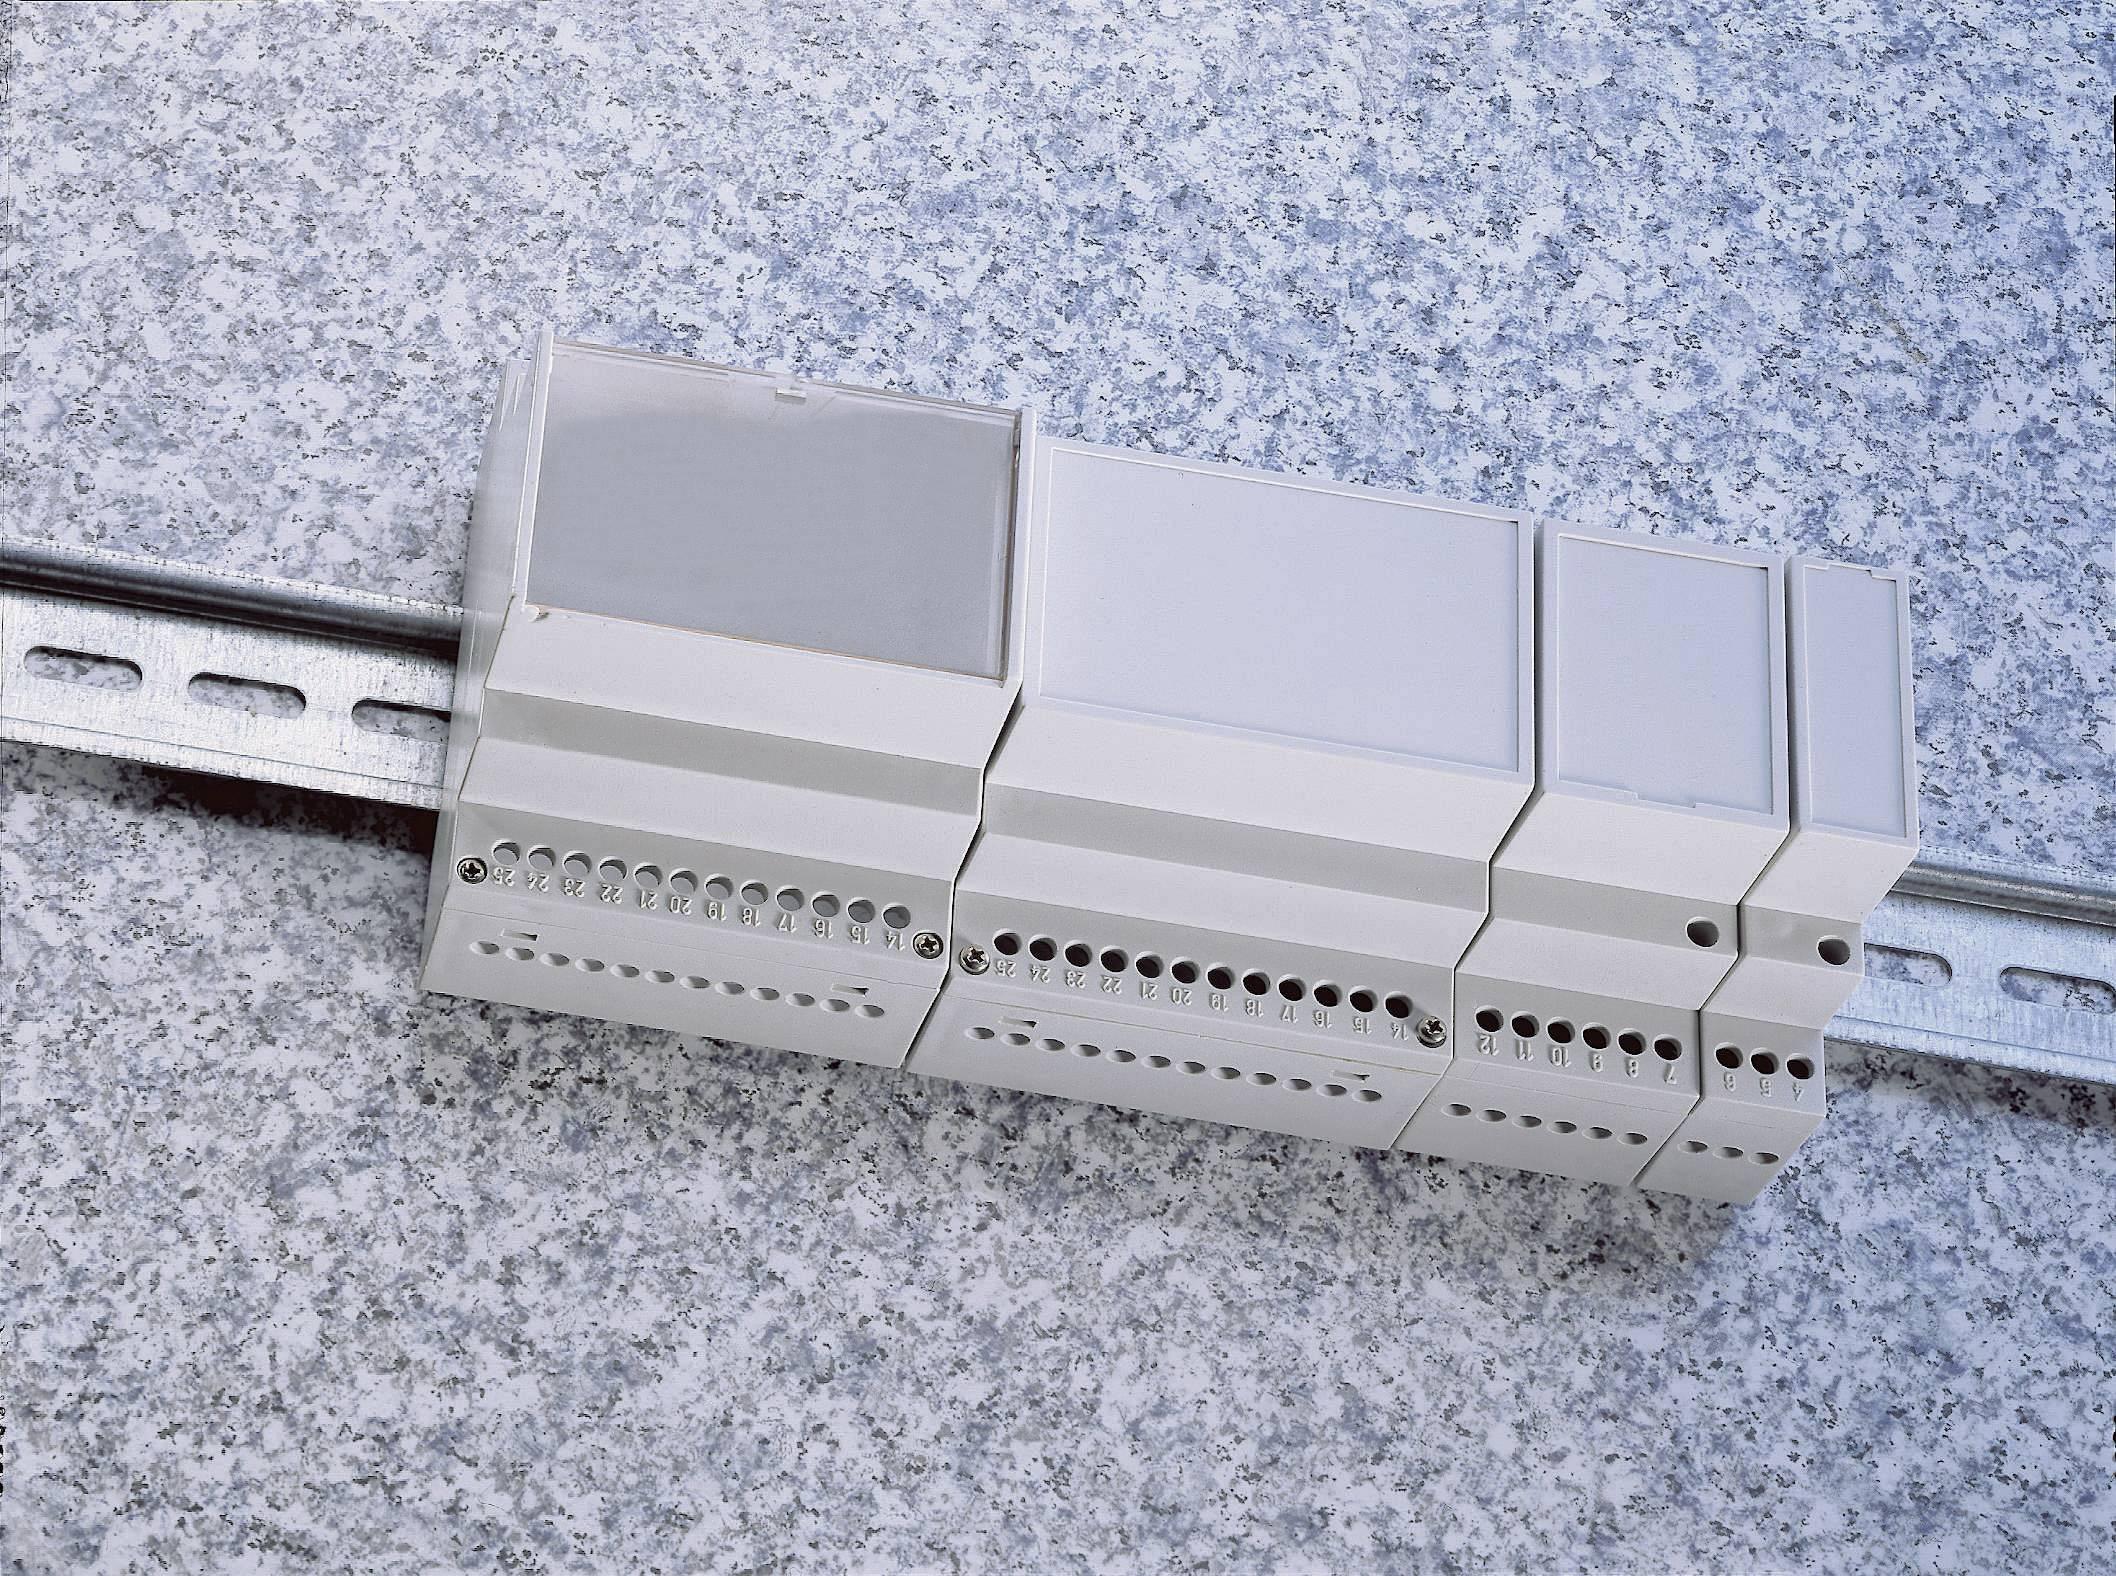 Pouzdro do lišty MR9/C FA RAL7035 ABS (018037129135), 157,5 x 90 x 68 mm